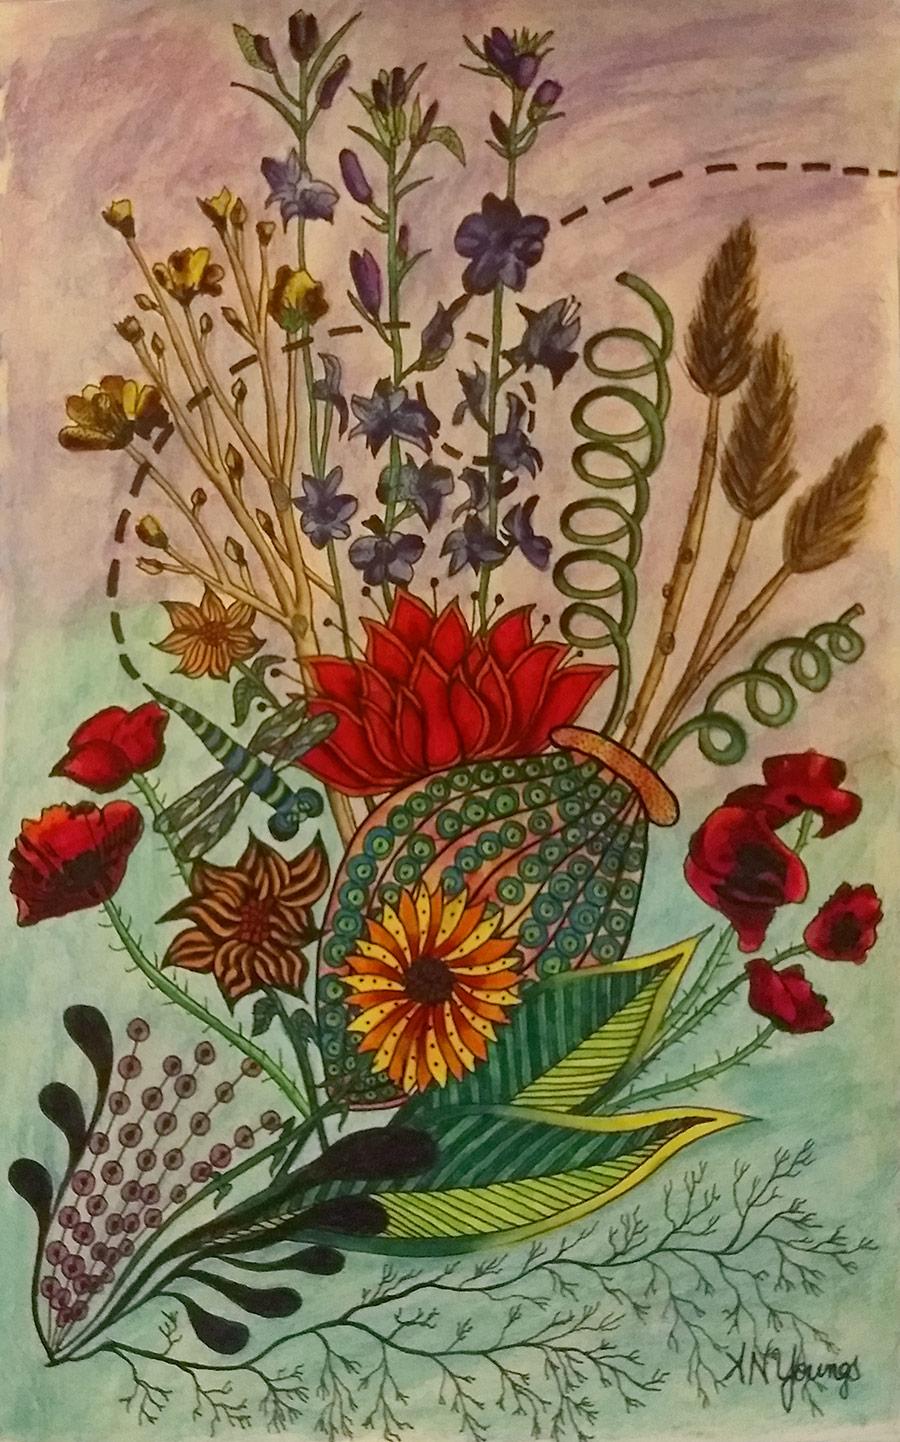 Summer Flower Garden - Aimee N. Youngs | Aimee N. Youngs